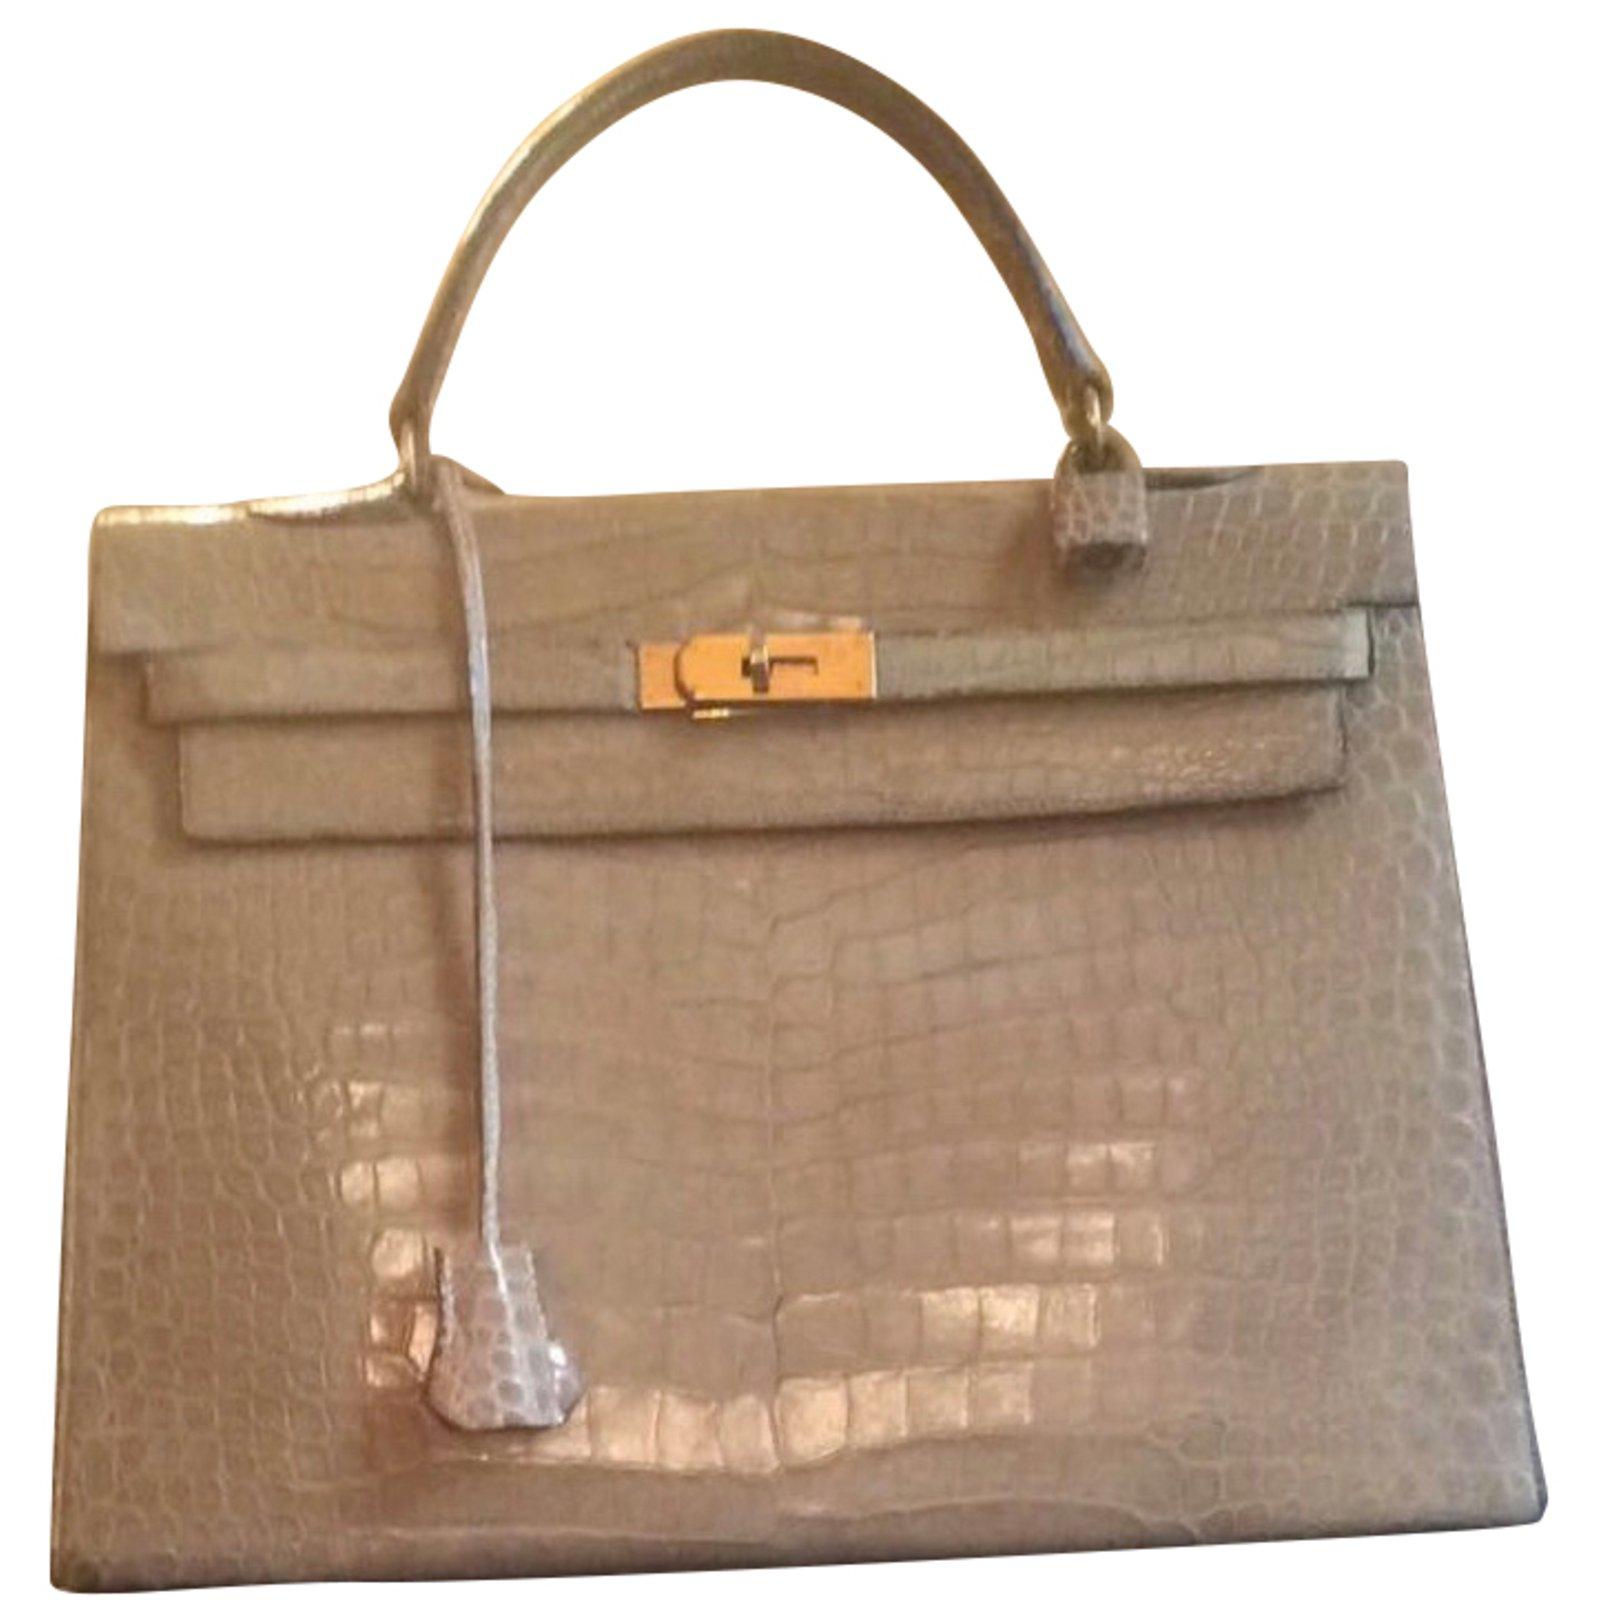 28eb0bdf9361 ... cheapest hermès kelly 35 vintage crocodile handbags exotic leather  beige ref.43089 3450b dcd20